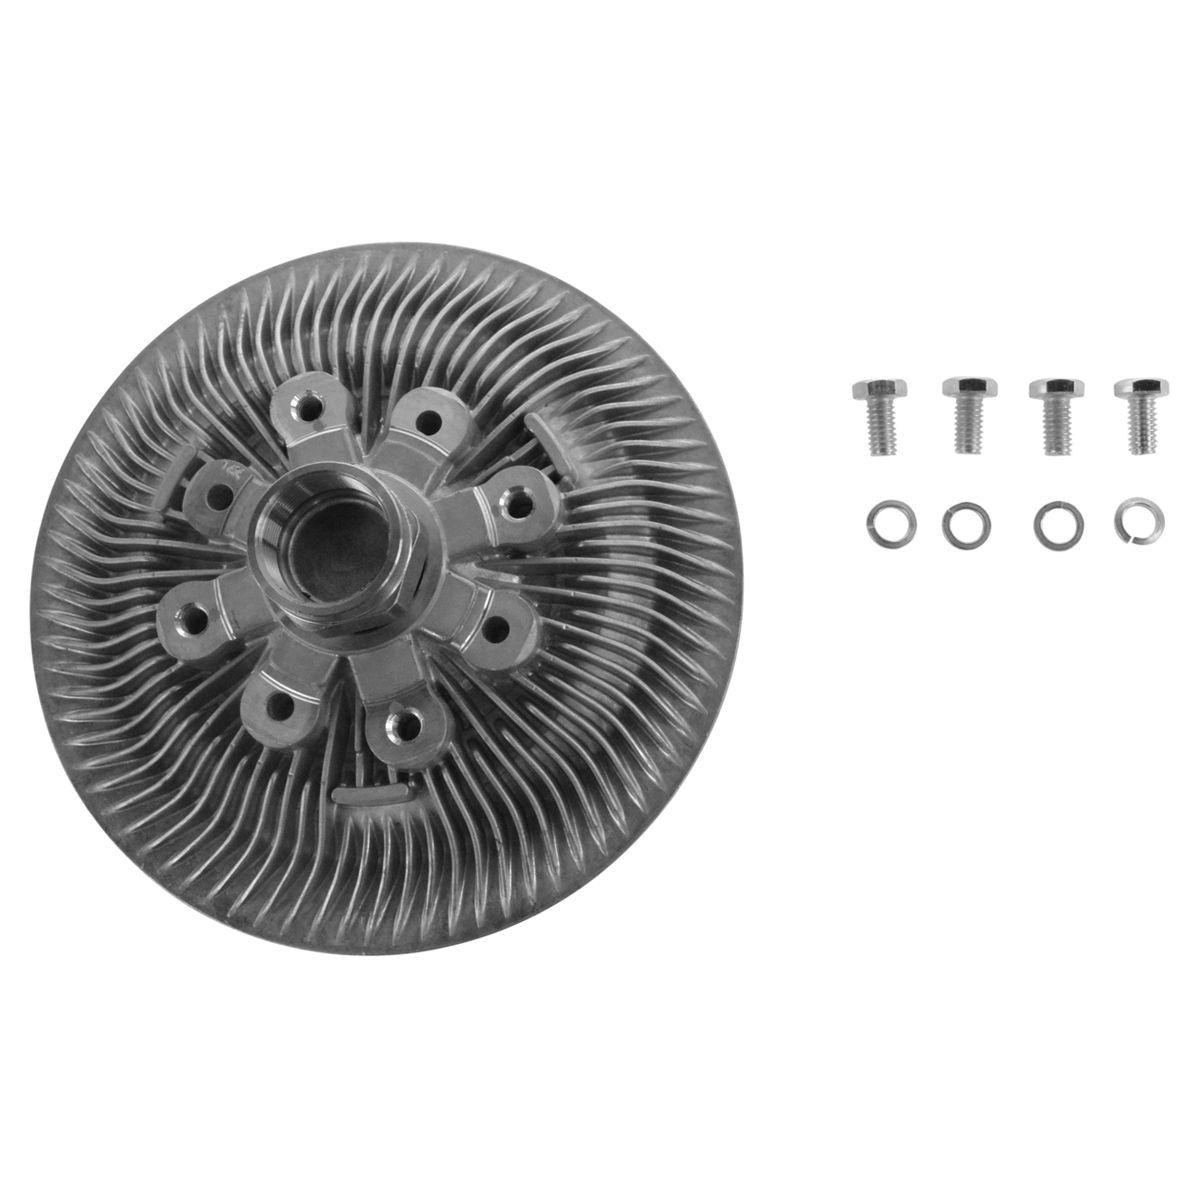 hight resolution of radiator cooling fan clutch for dodge durango dakota